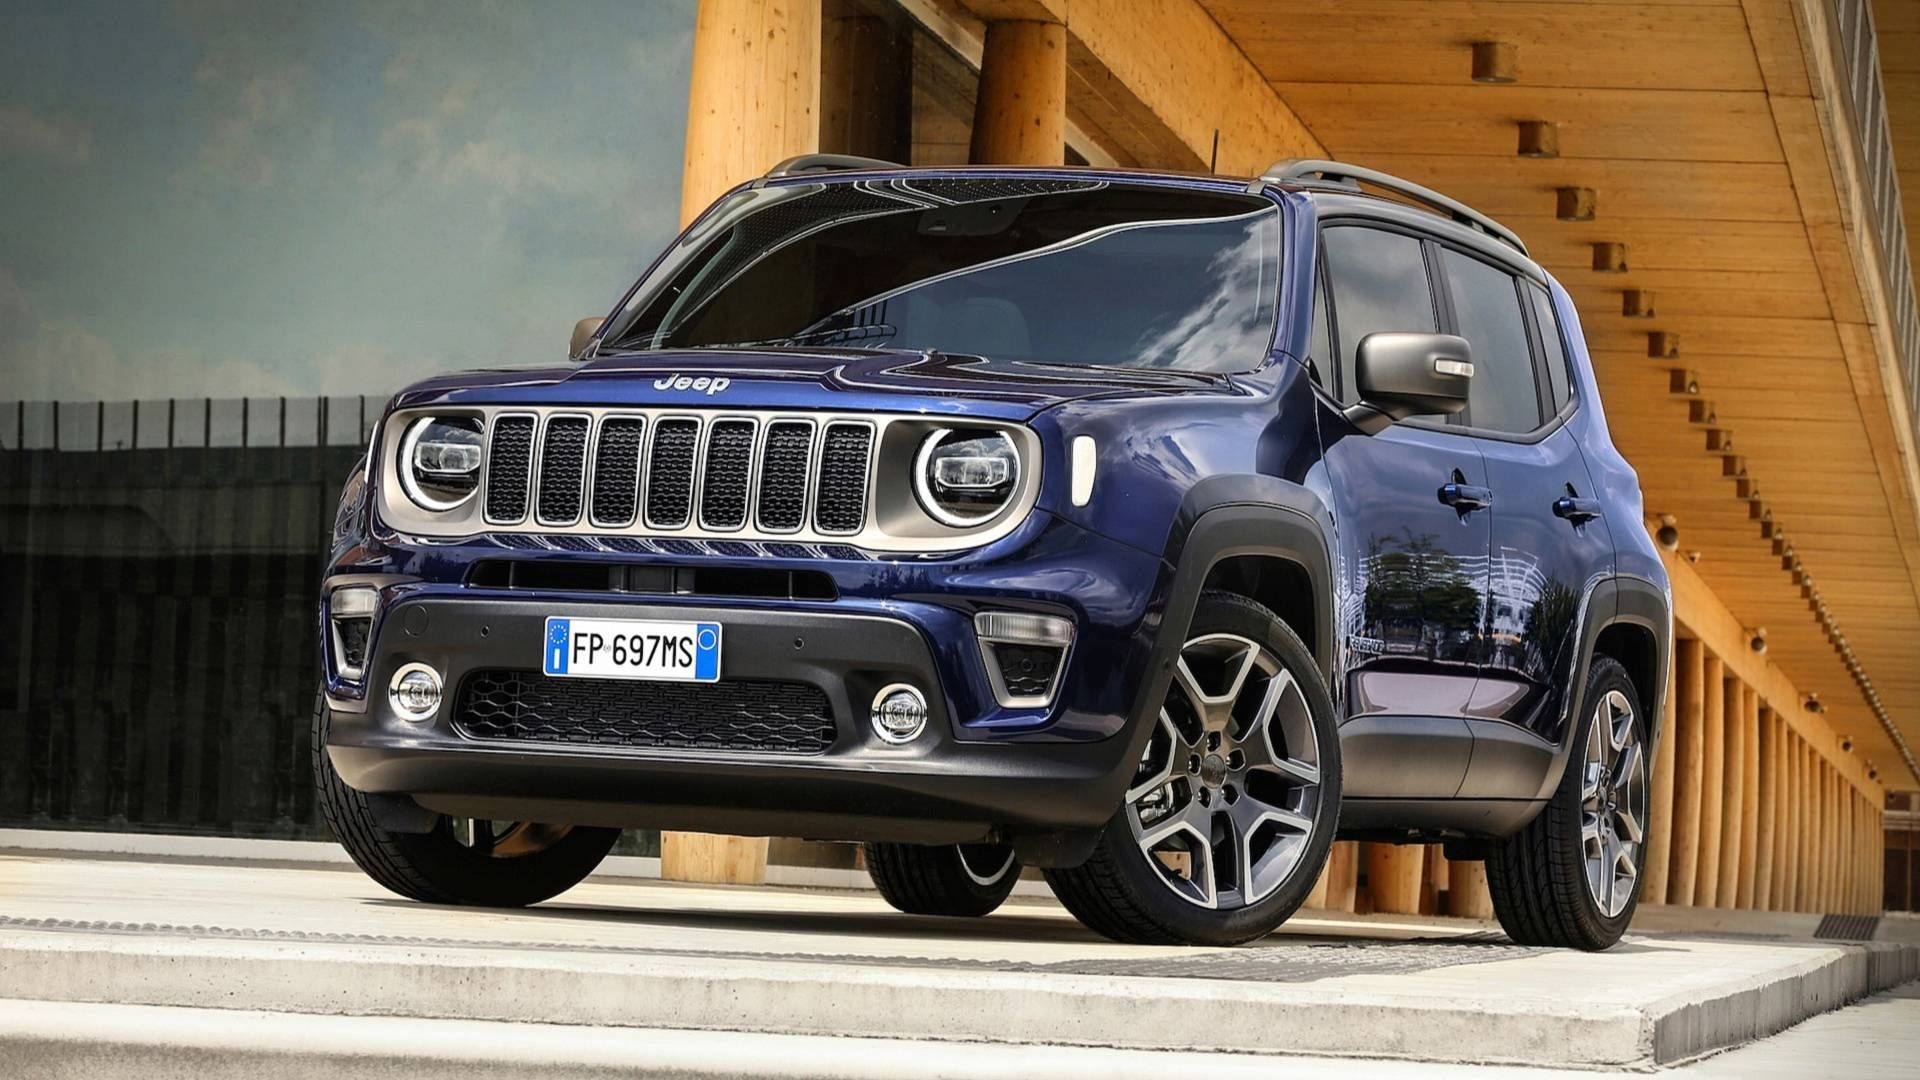 2019 Jeep Renegade Jeep Renegade Lifted Trucks Jeep Cars